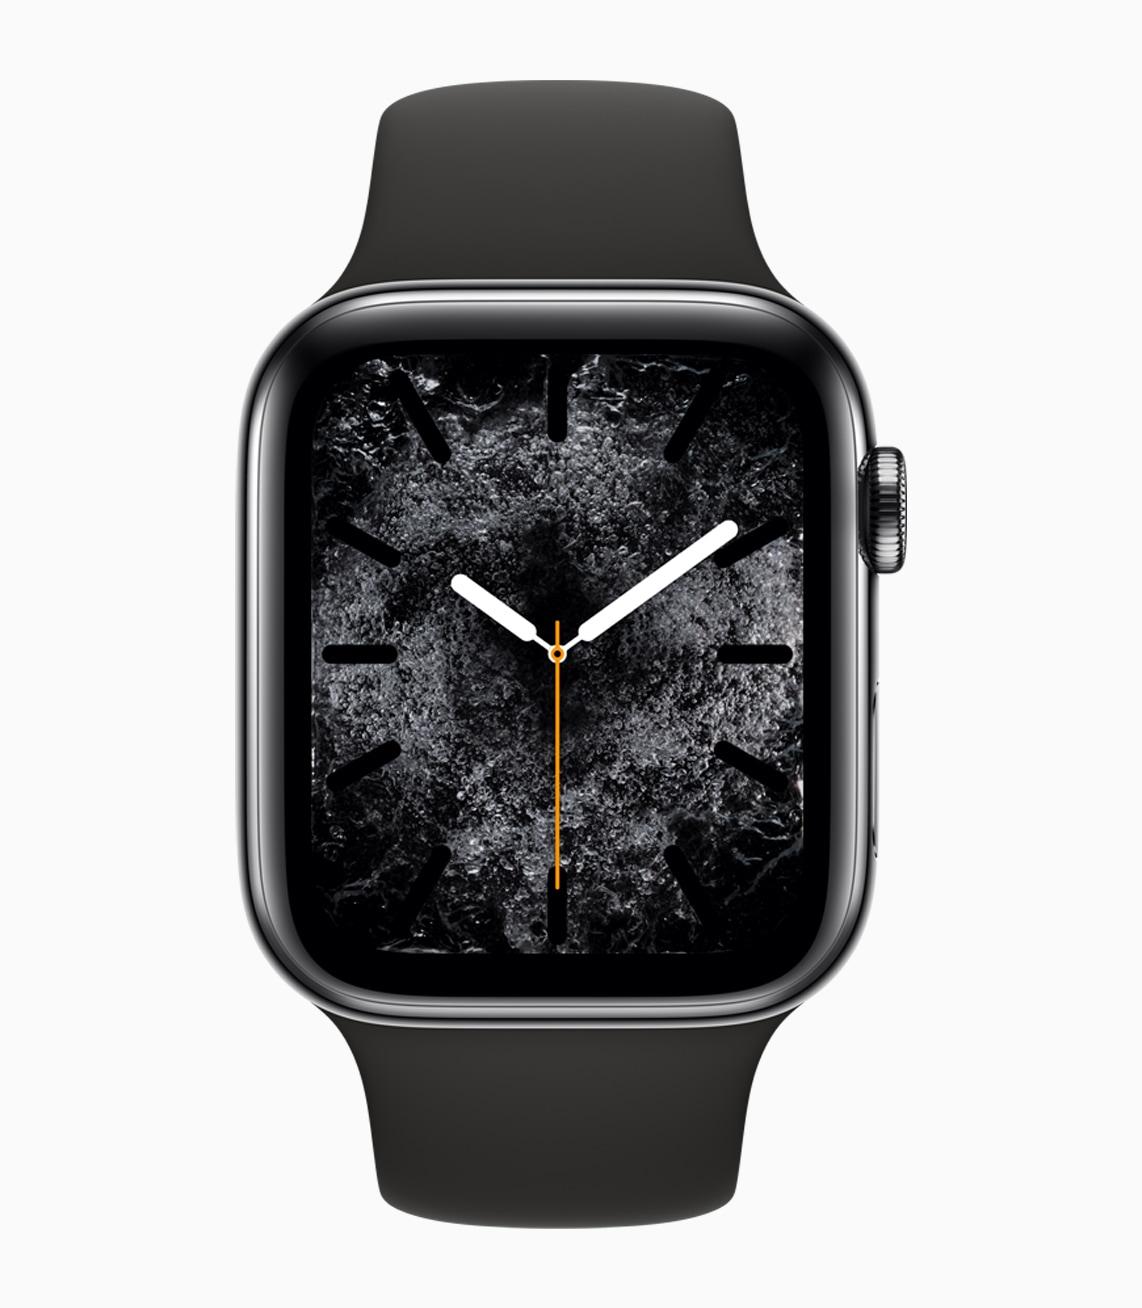 Apple Watch Series 4 Water Dial